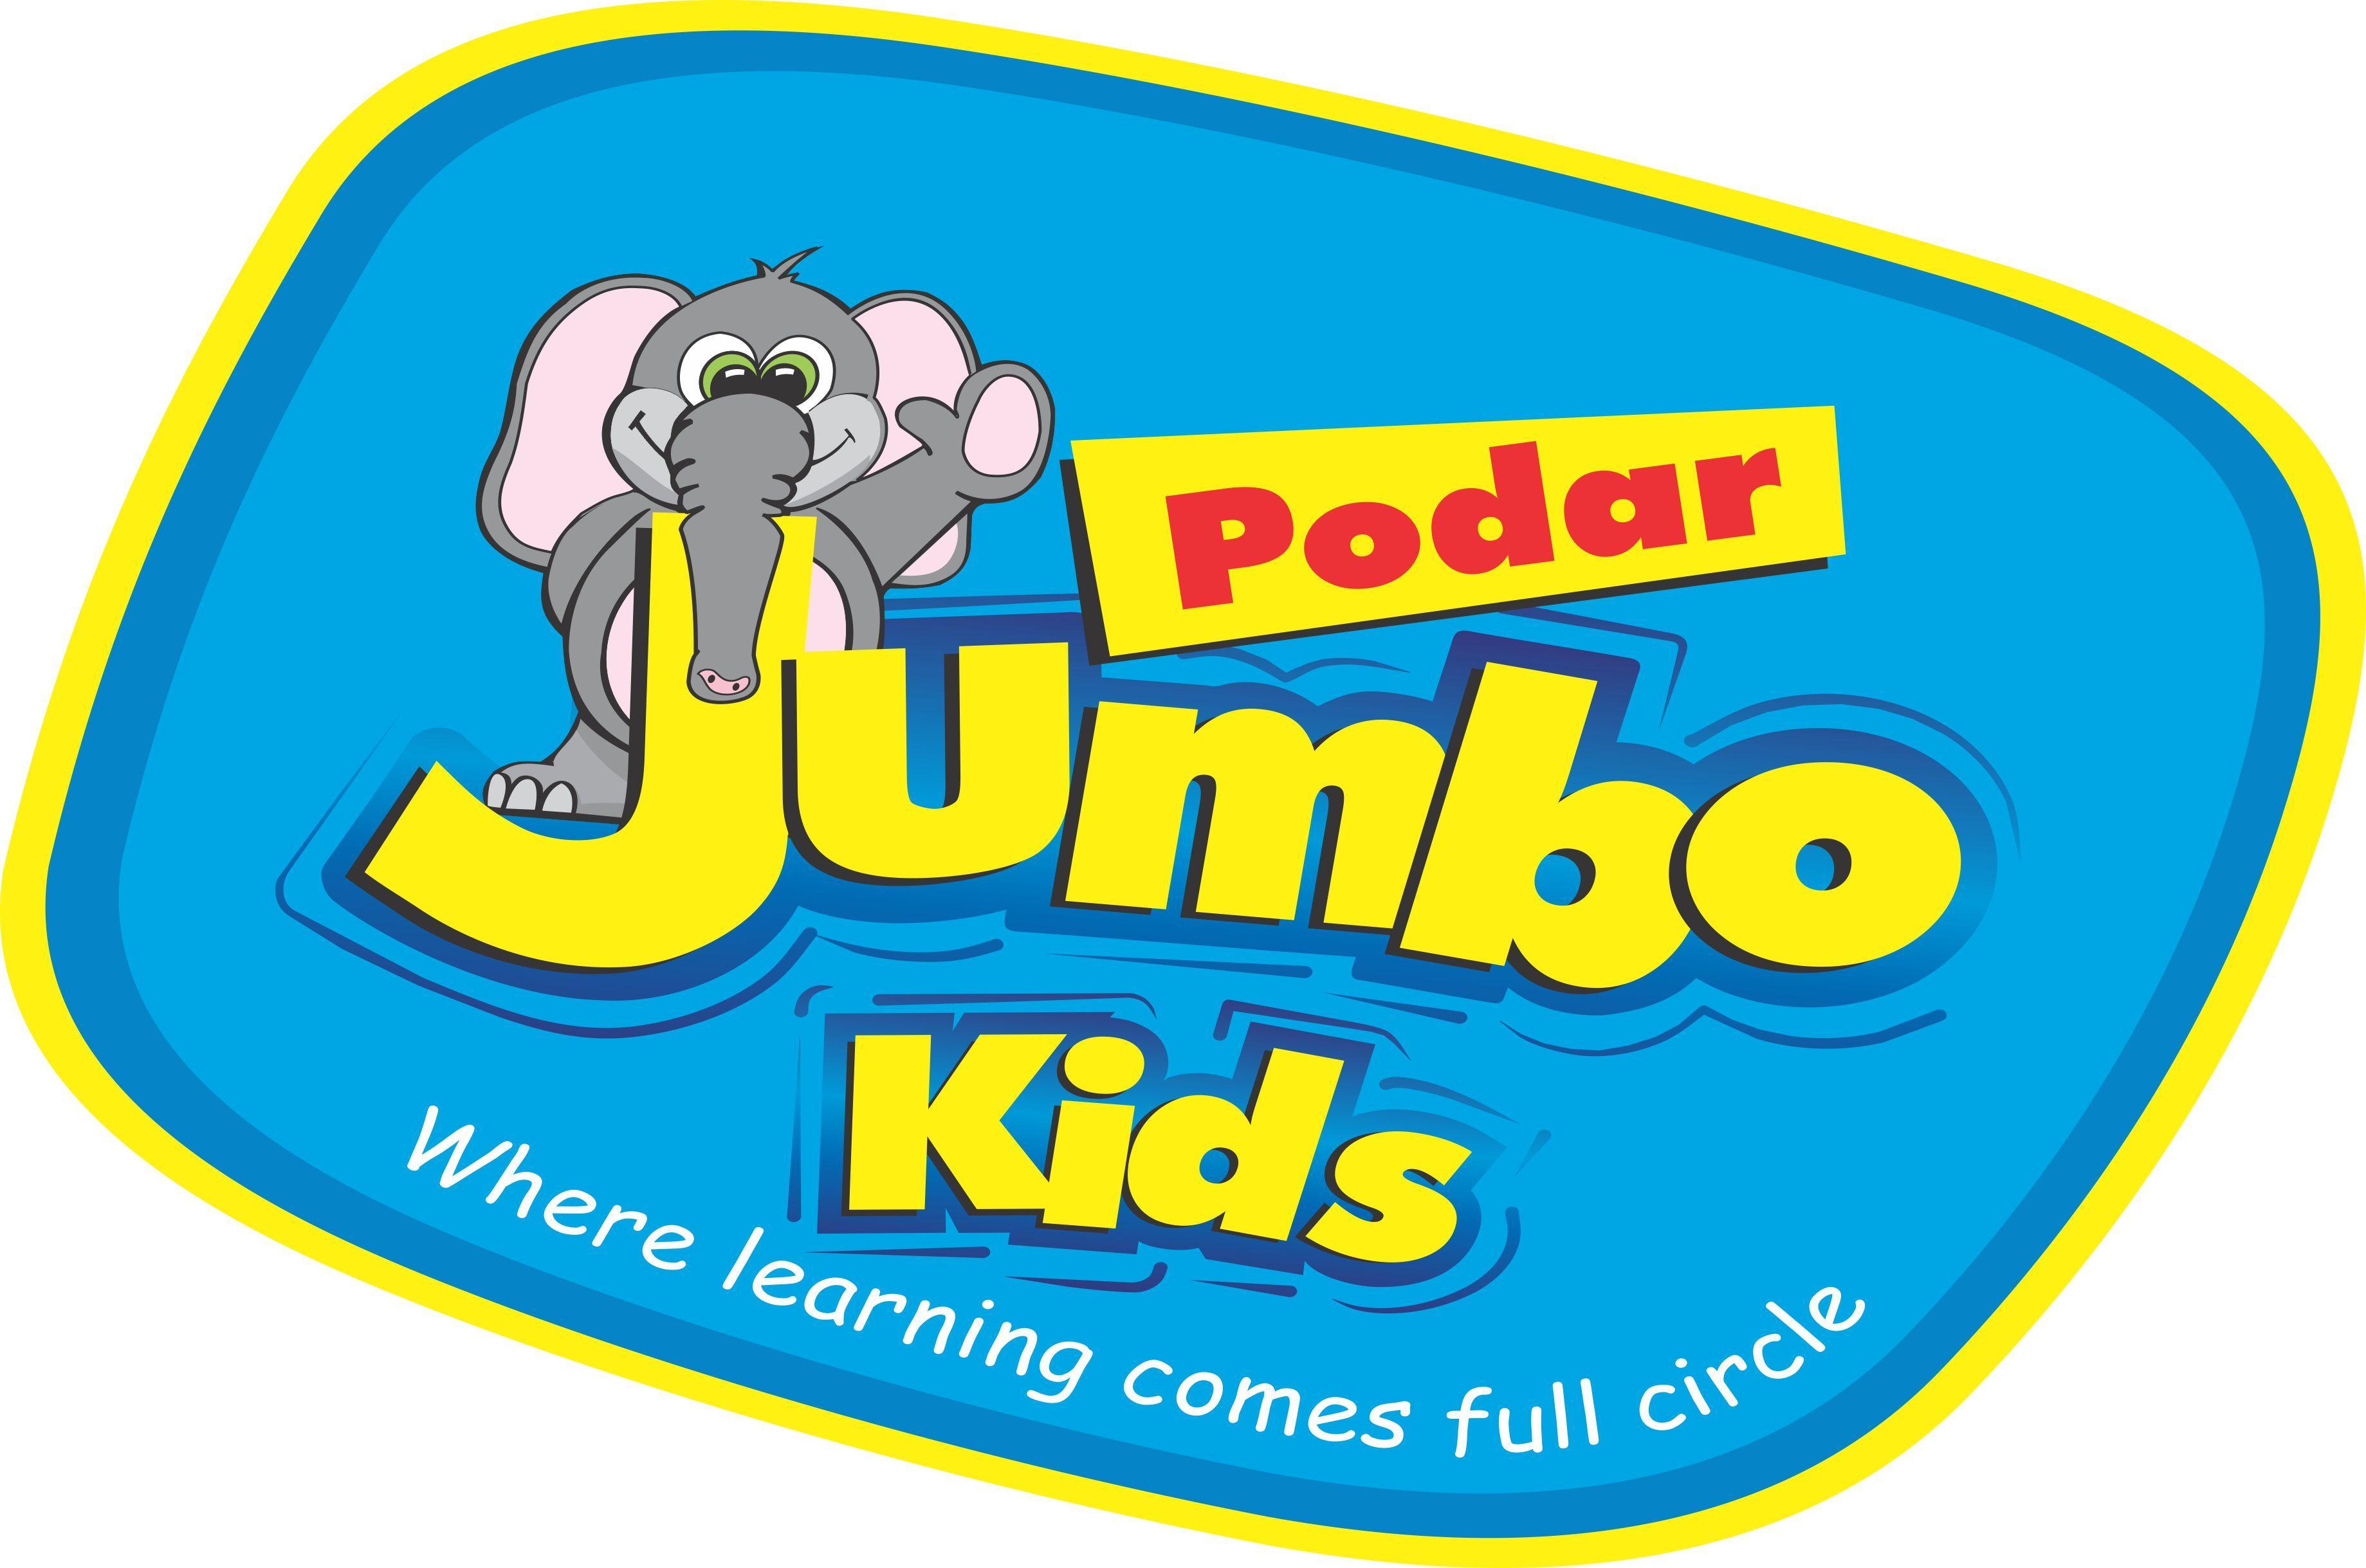 Podar Jumbo Kids - Bagalgunte, Podar Jumbo Kids - Bagalgunte